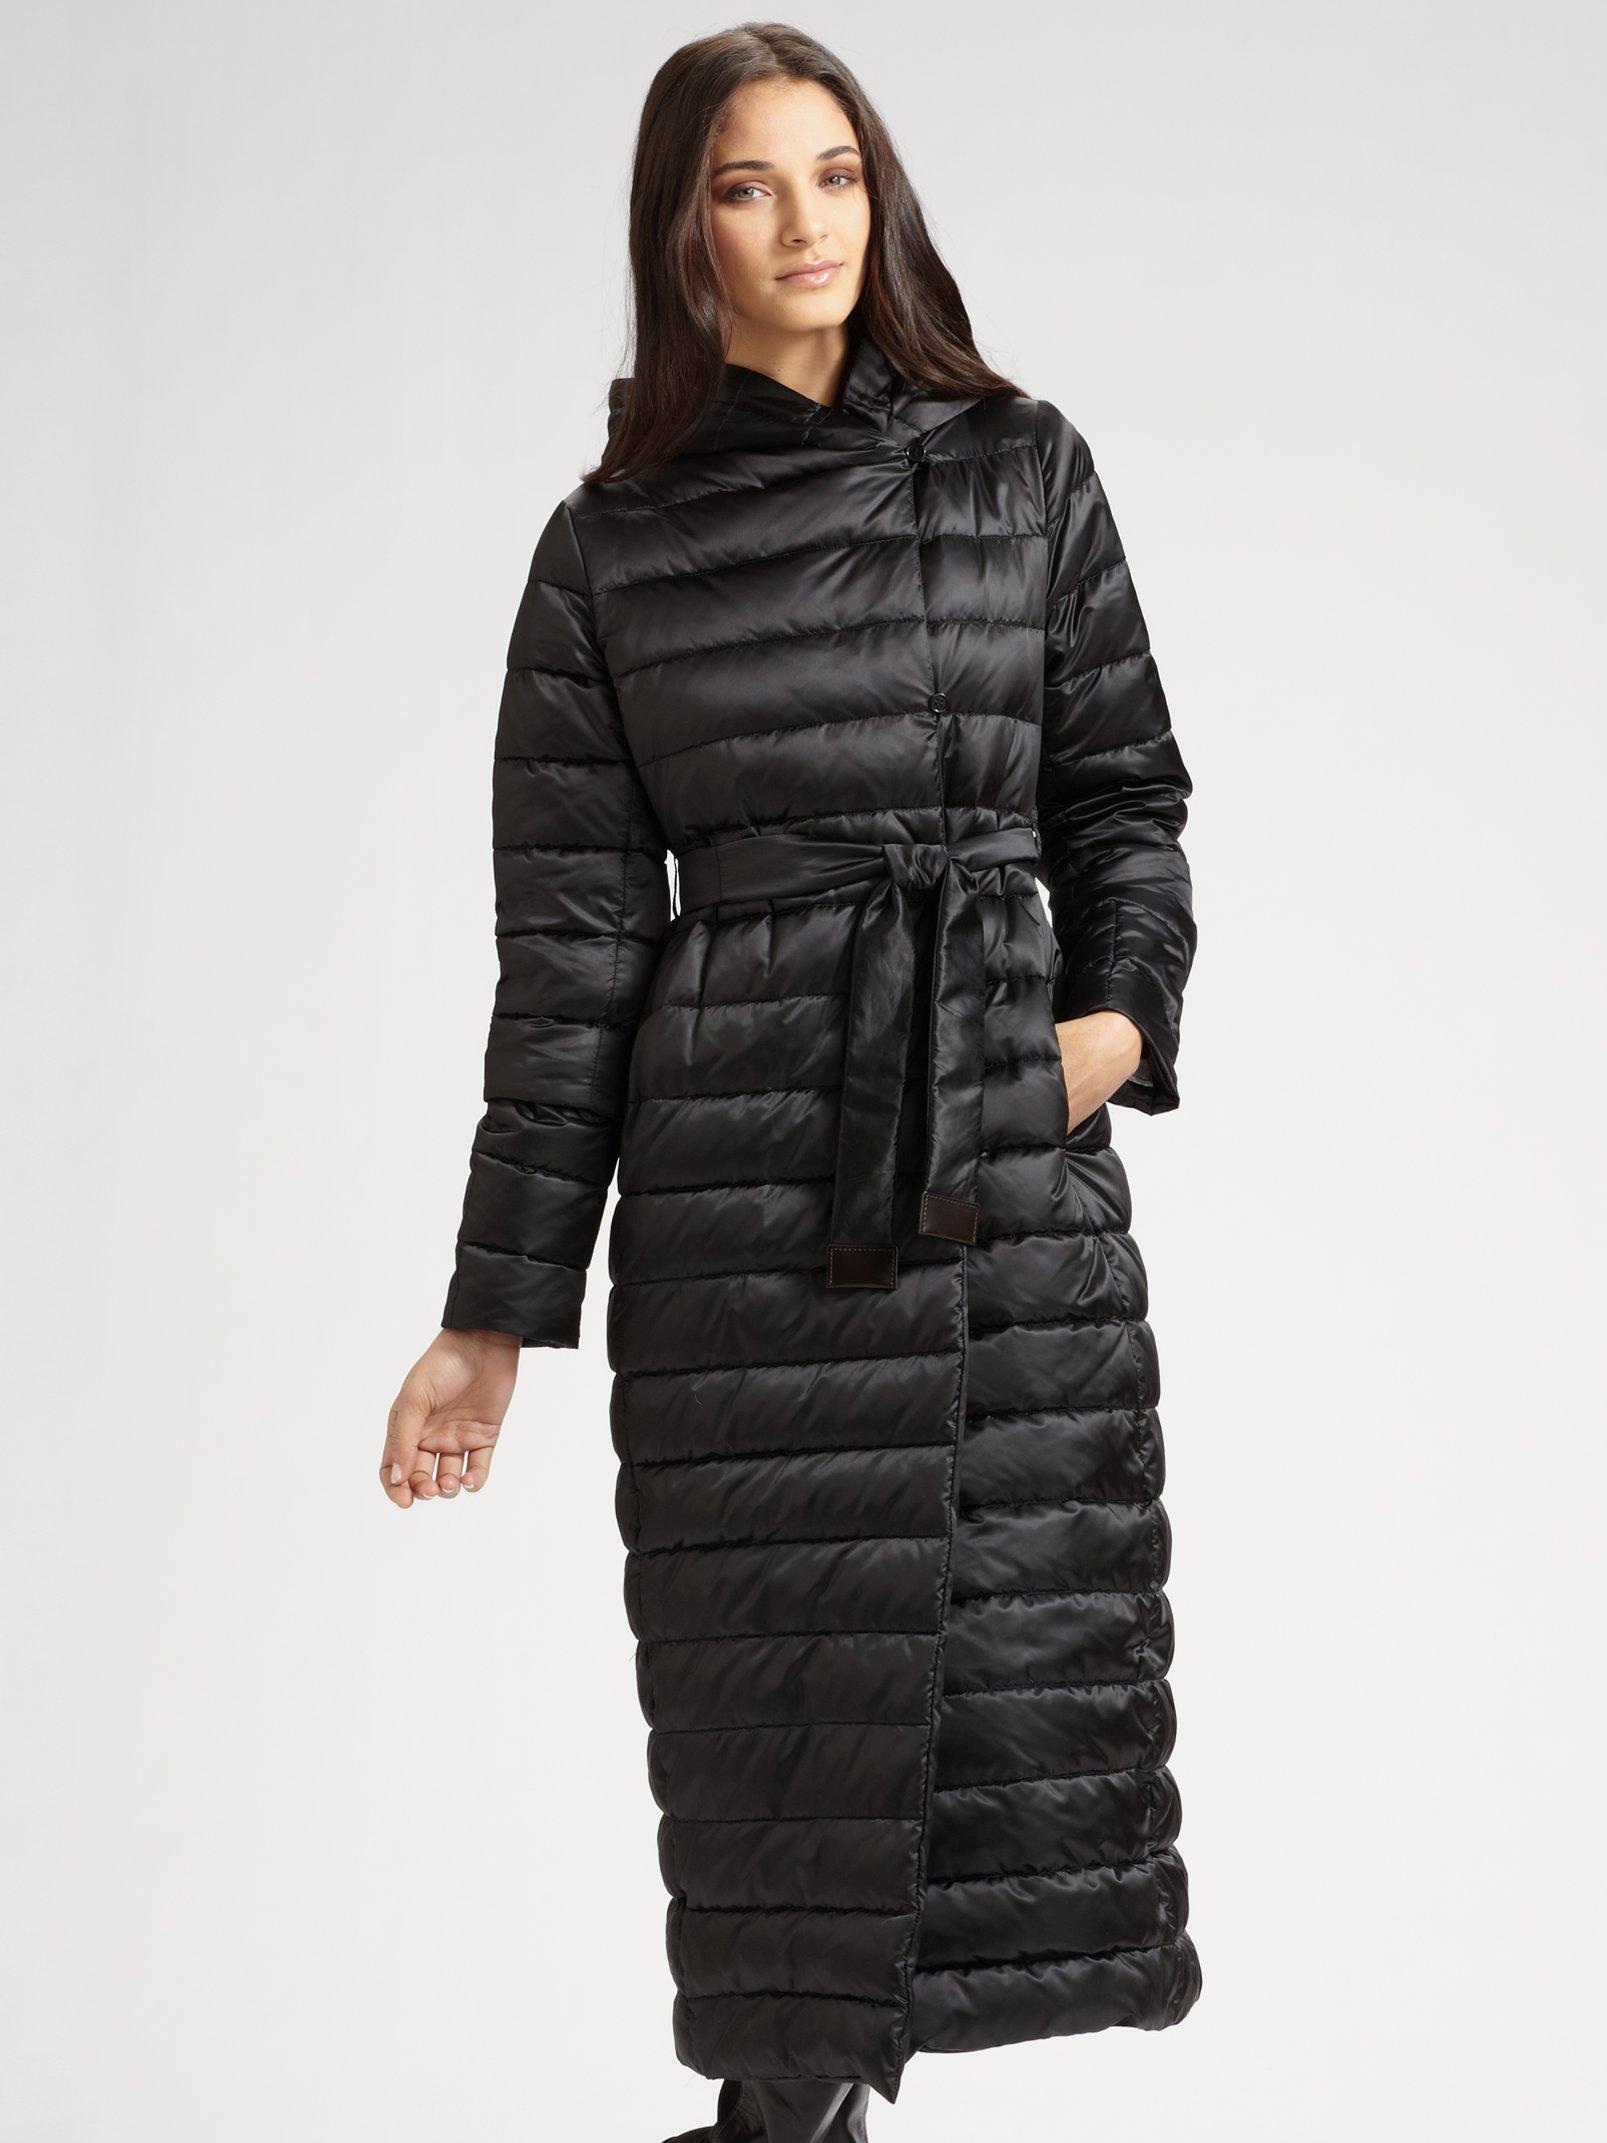 Max Mara Quilted Coat In Black Lyst